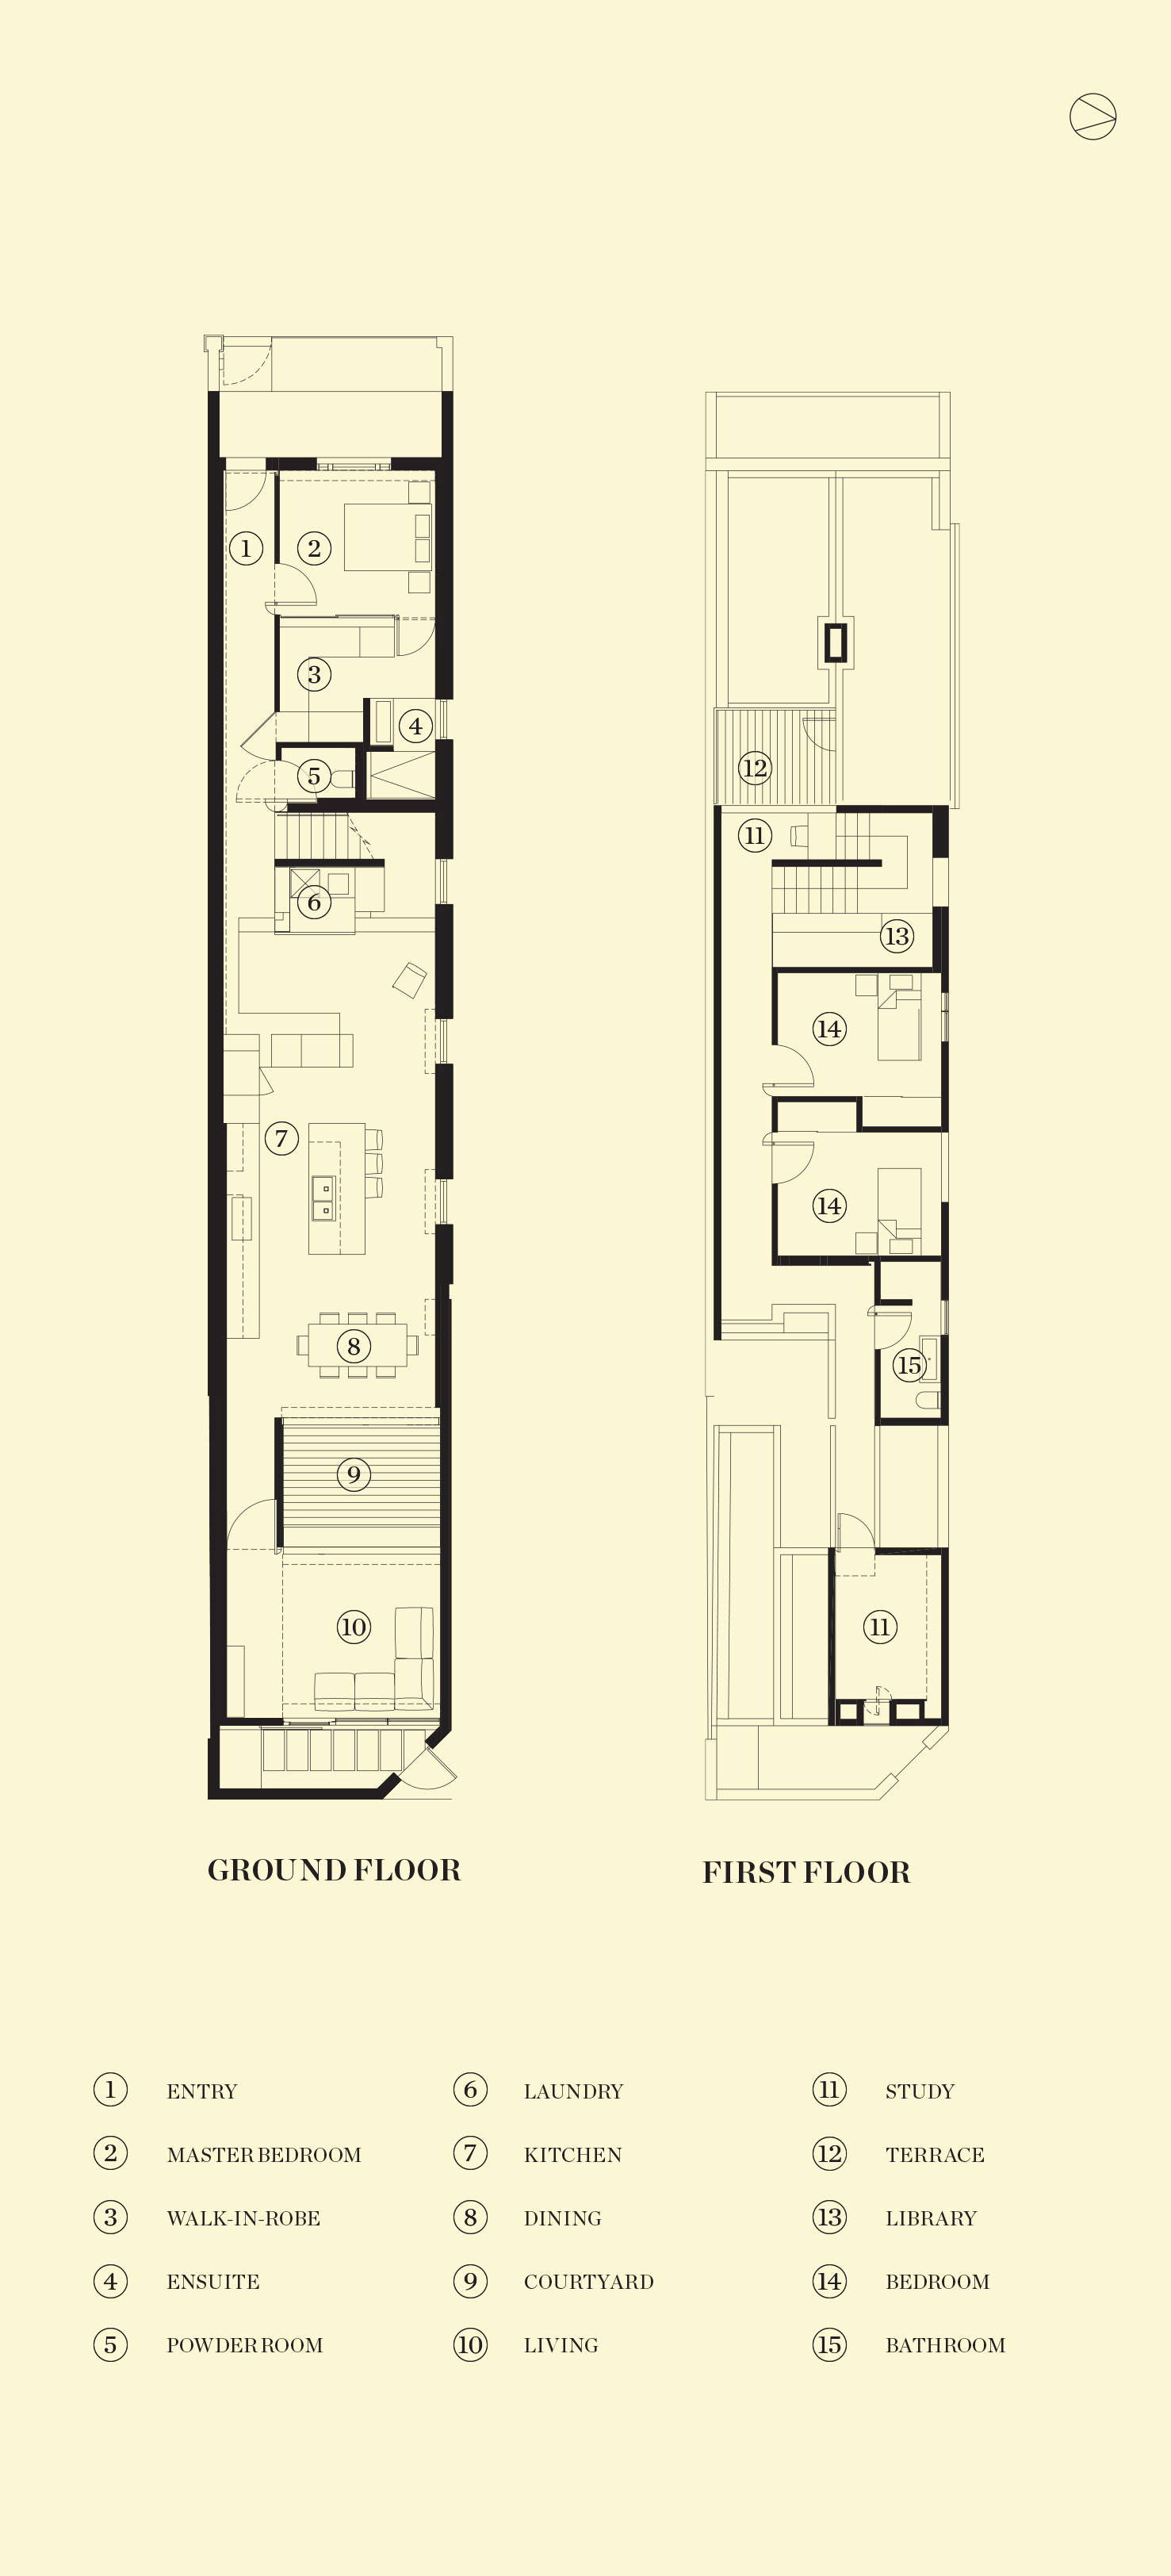 Station Street House By Robert Simeoni Architects